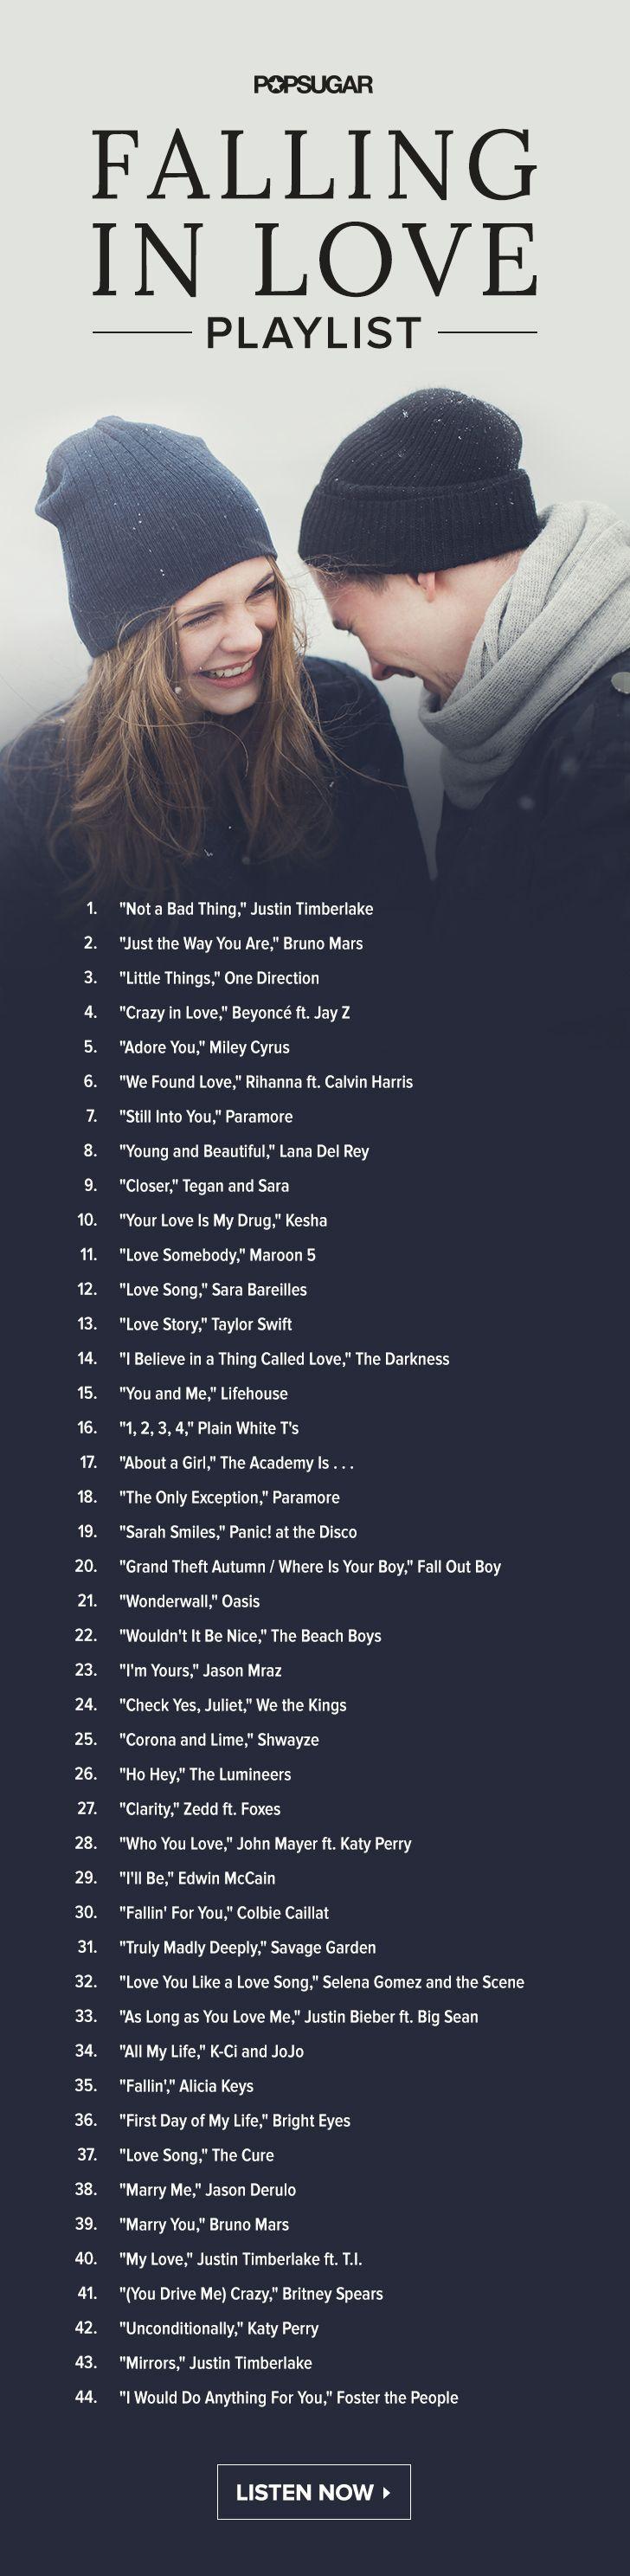 44 Songs Perfect For Falling In Love Piosenki Slubne Muzyka Romantyczna I Piosenki O Milosci